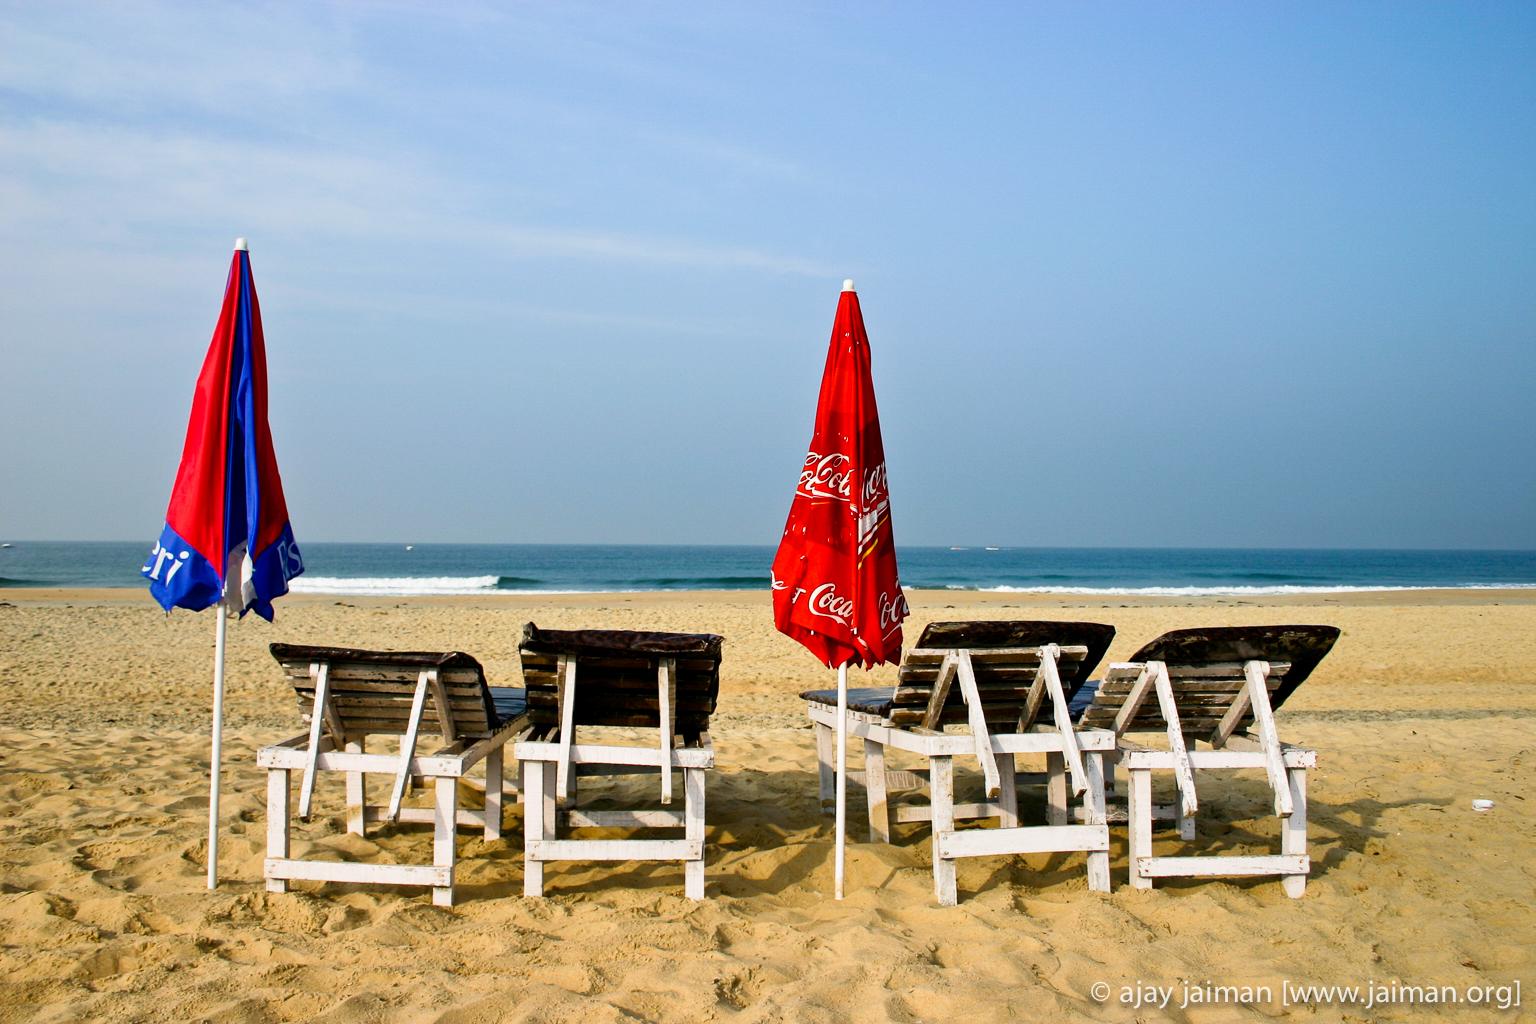 Varca Beach at Goa, India